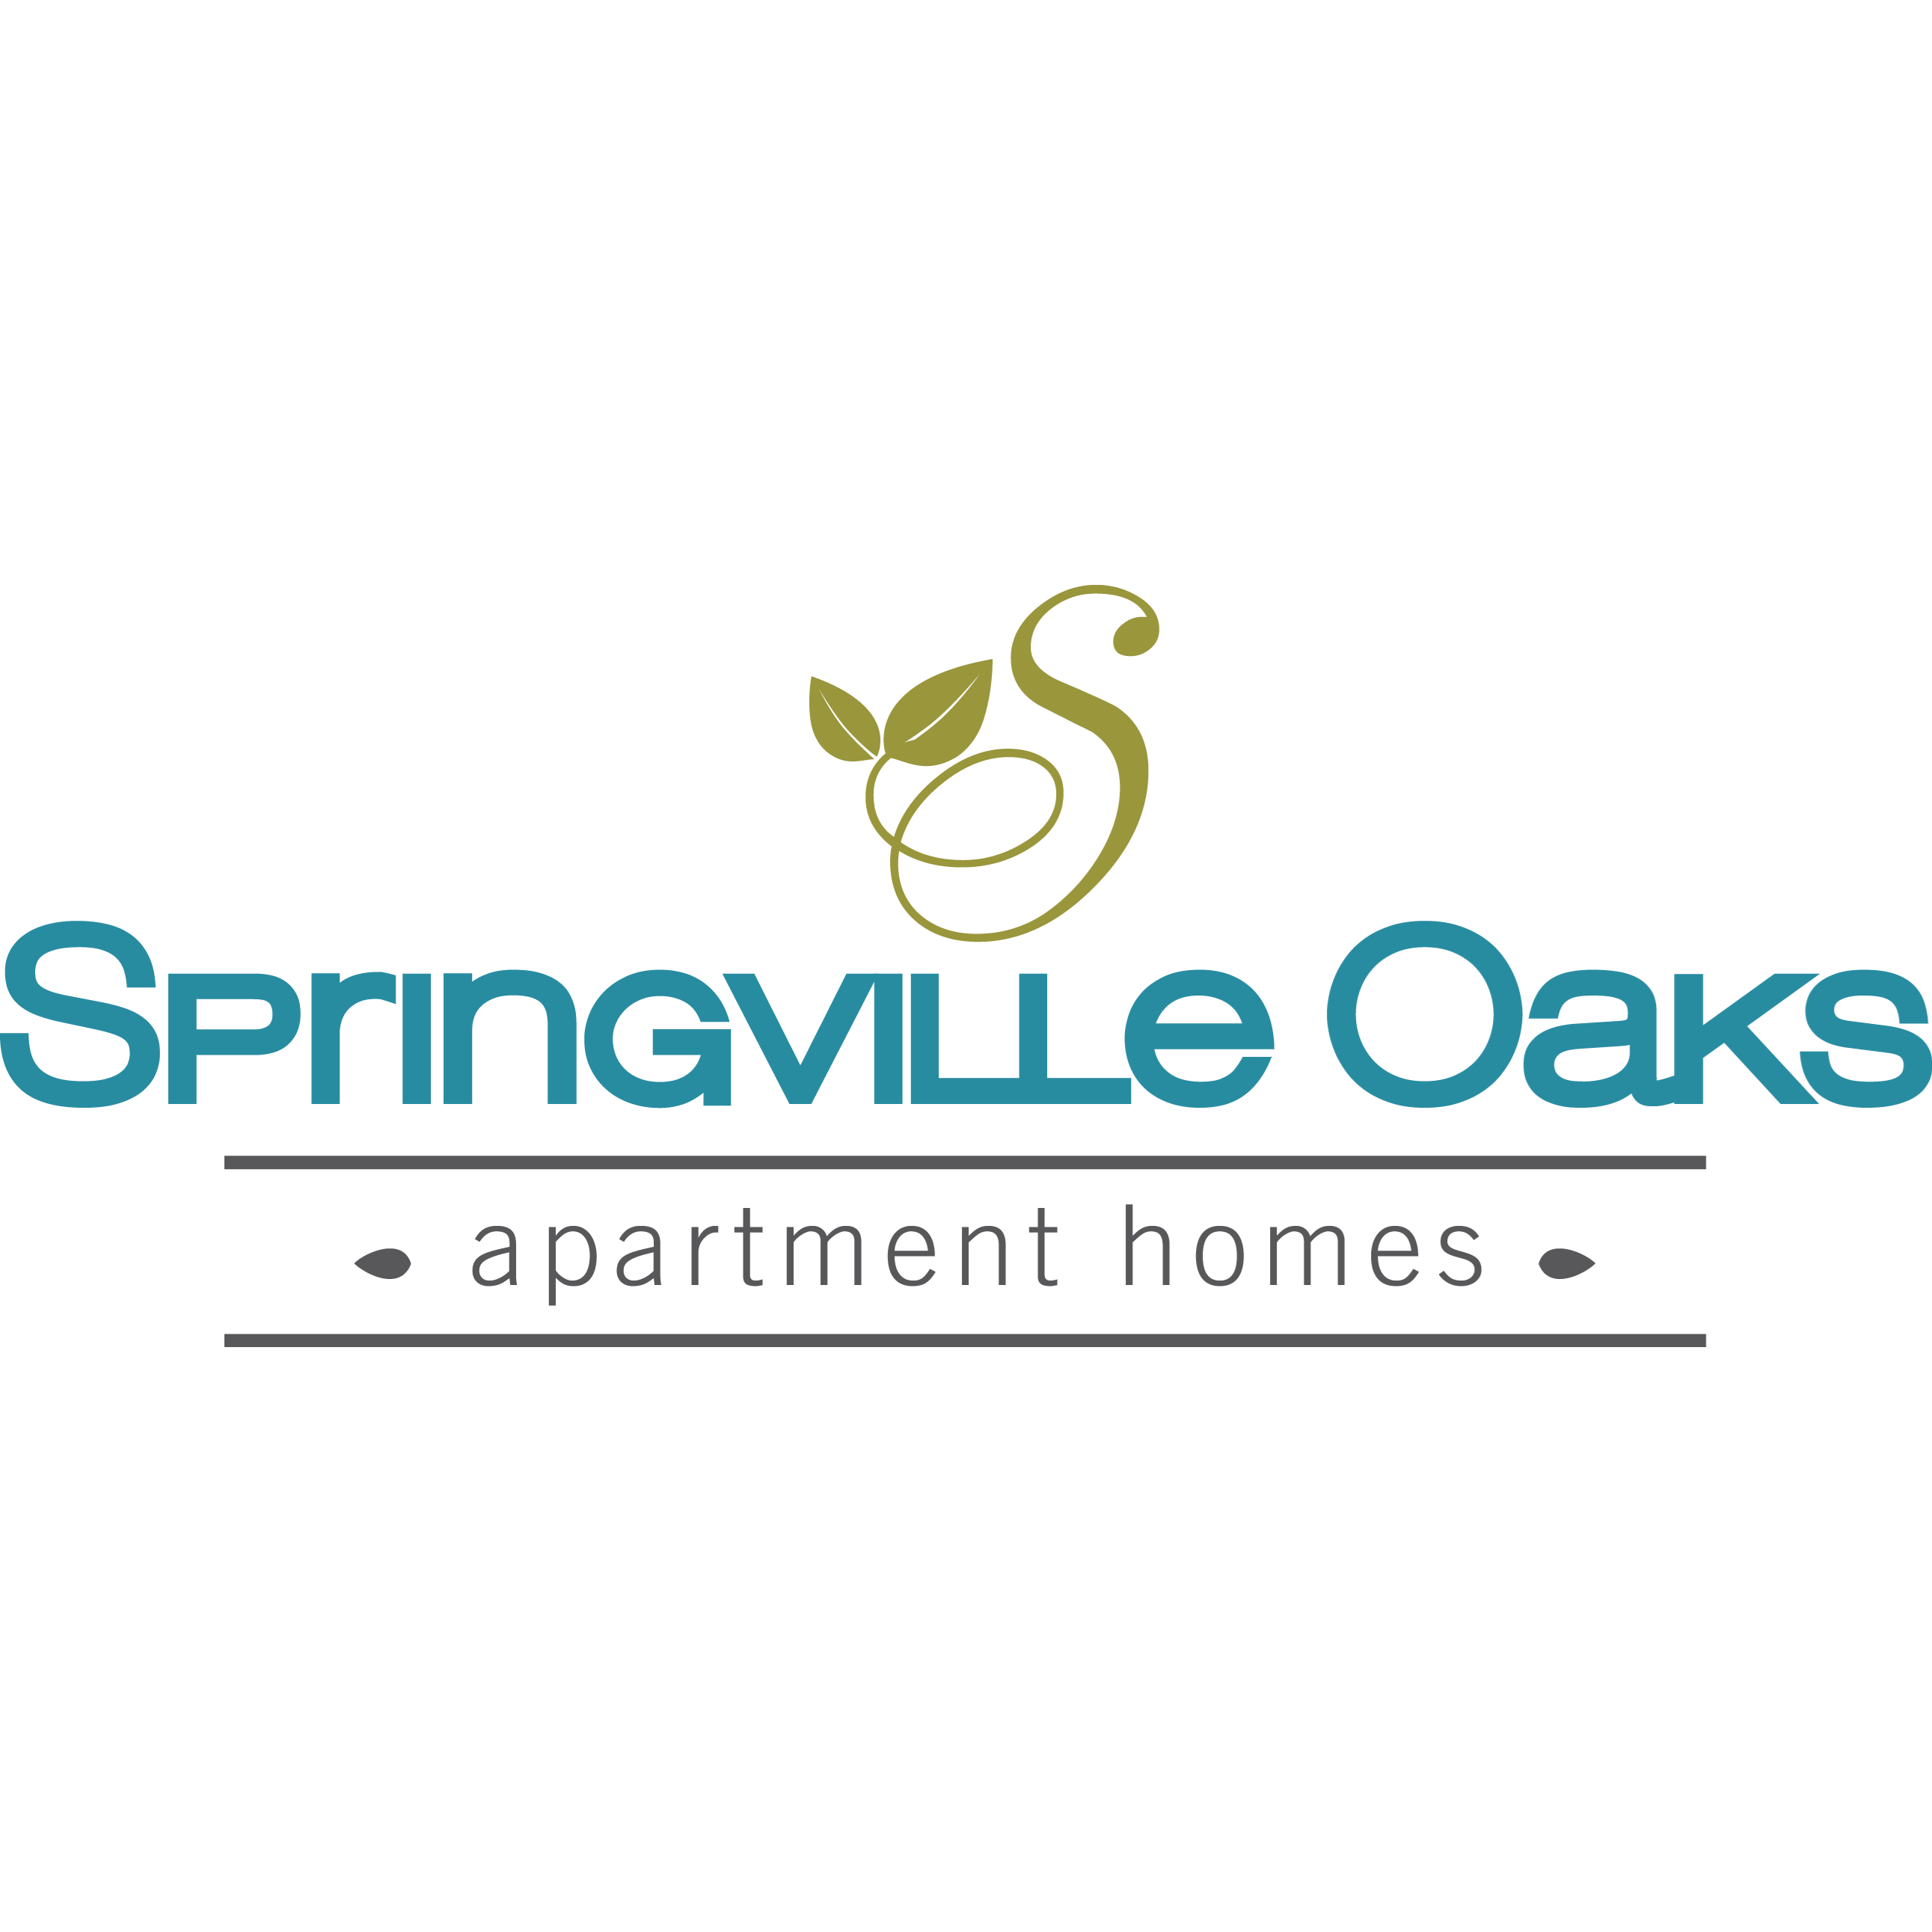 Springville Oaks Apartments